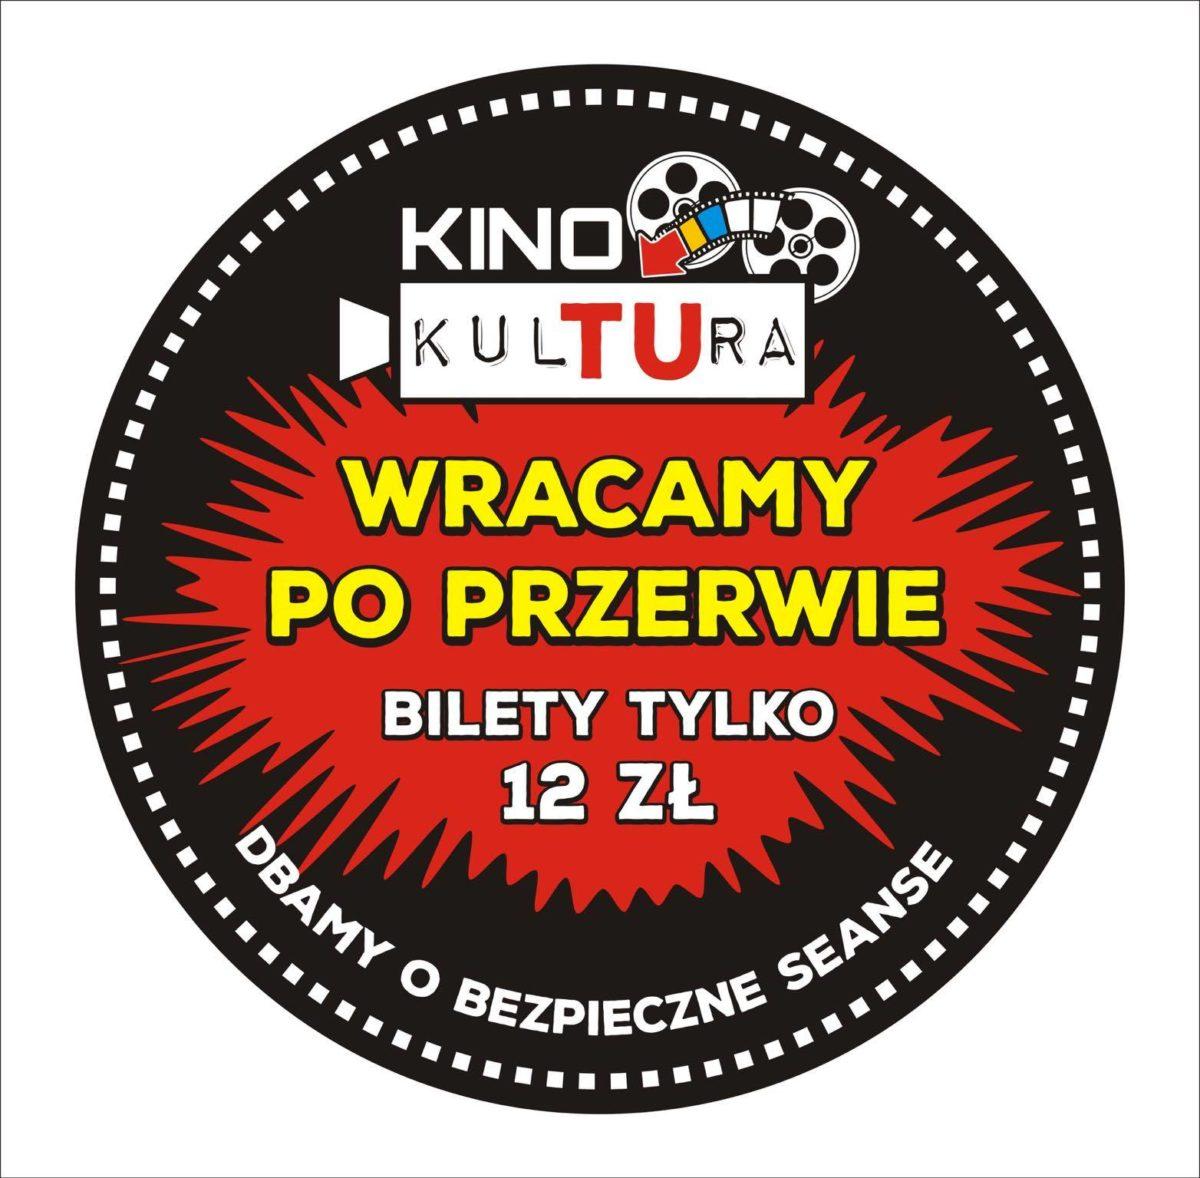 KINO KULTURA WRACA DO GRY!!!